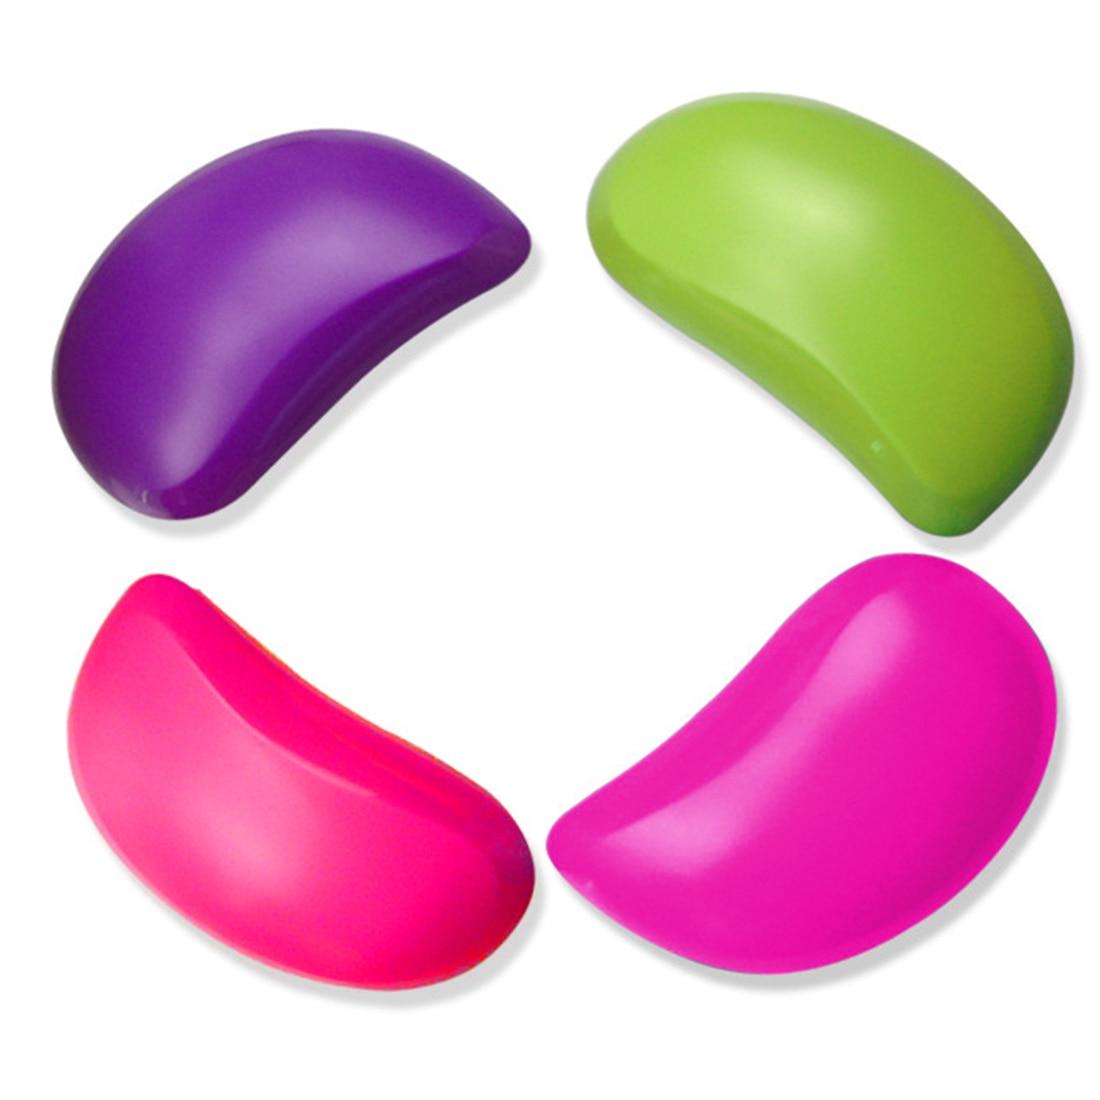 Portable Anti - static Hairdressing Comb Creative Mango - shaped  Magic Detangling Smooth No Knot Comb Salon Styling Tamer Tool